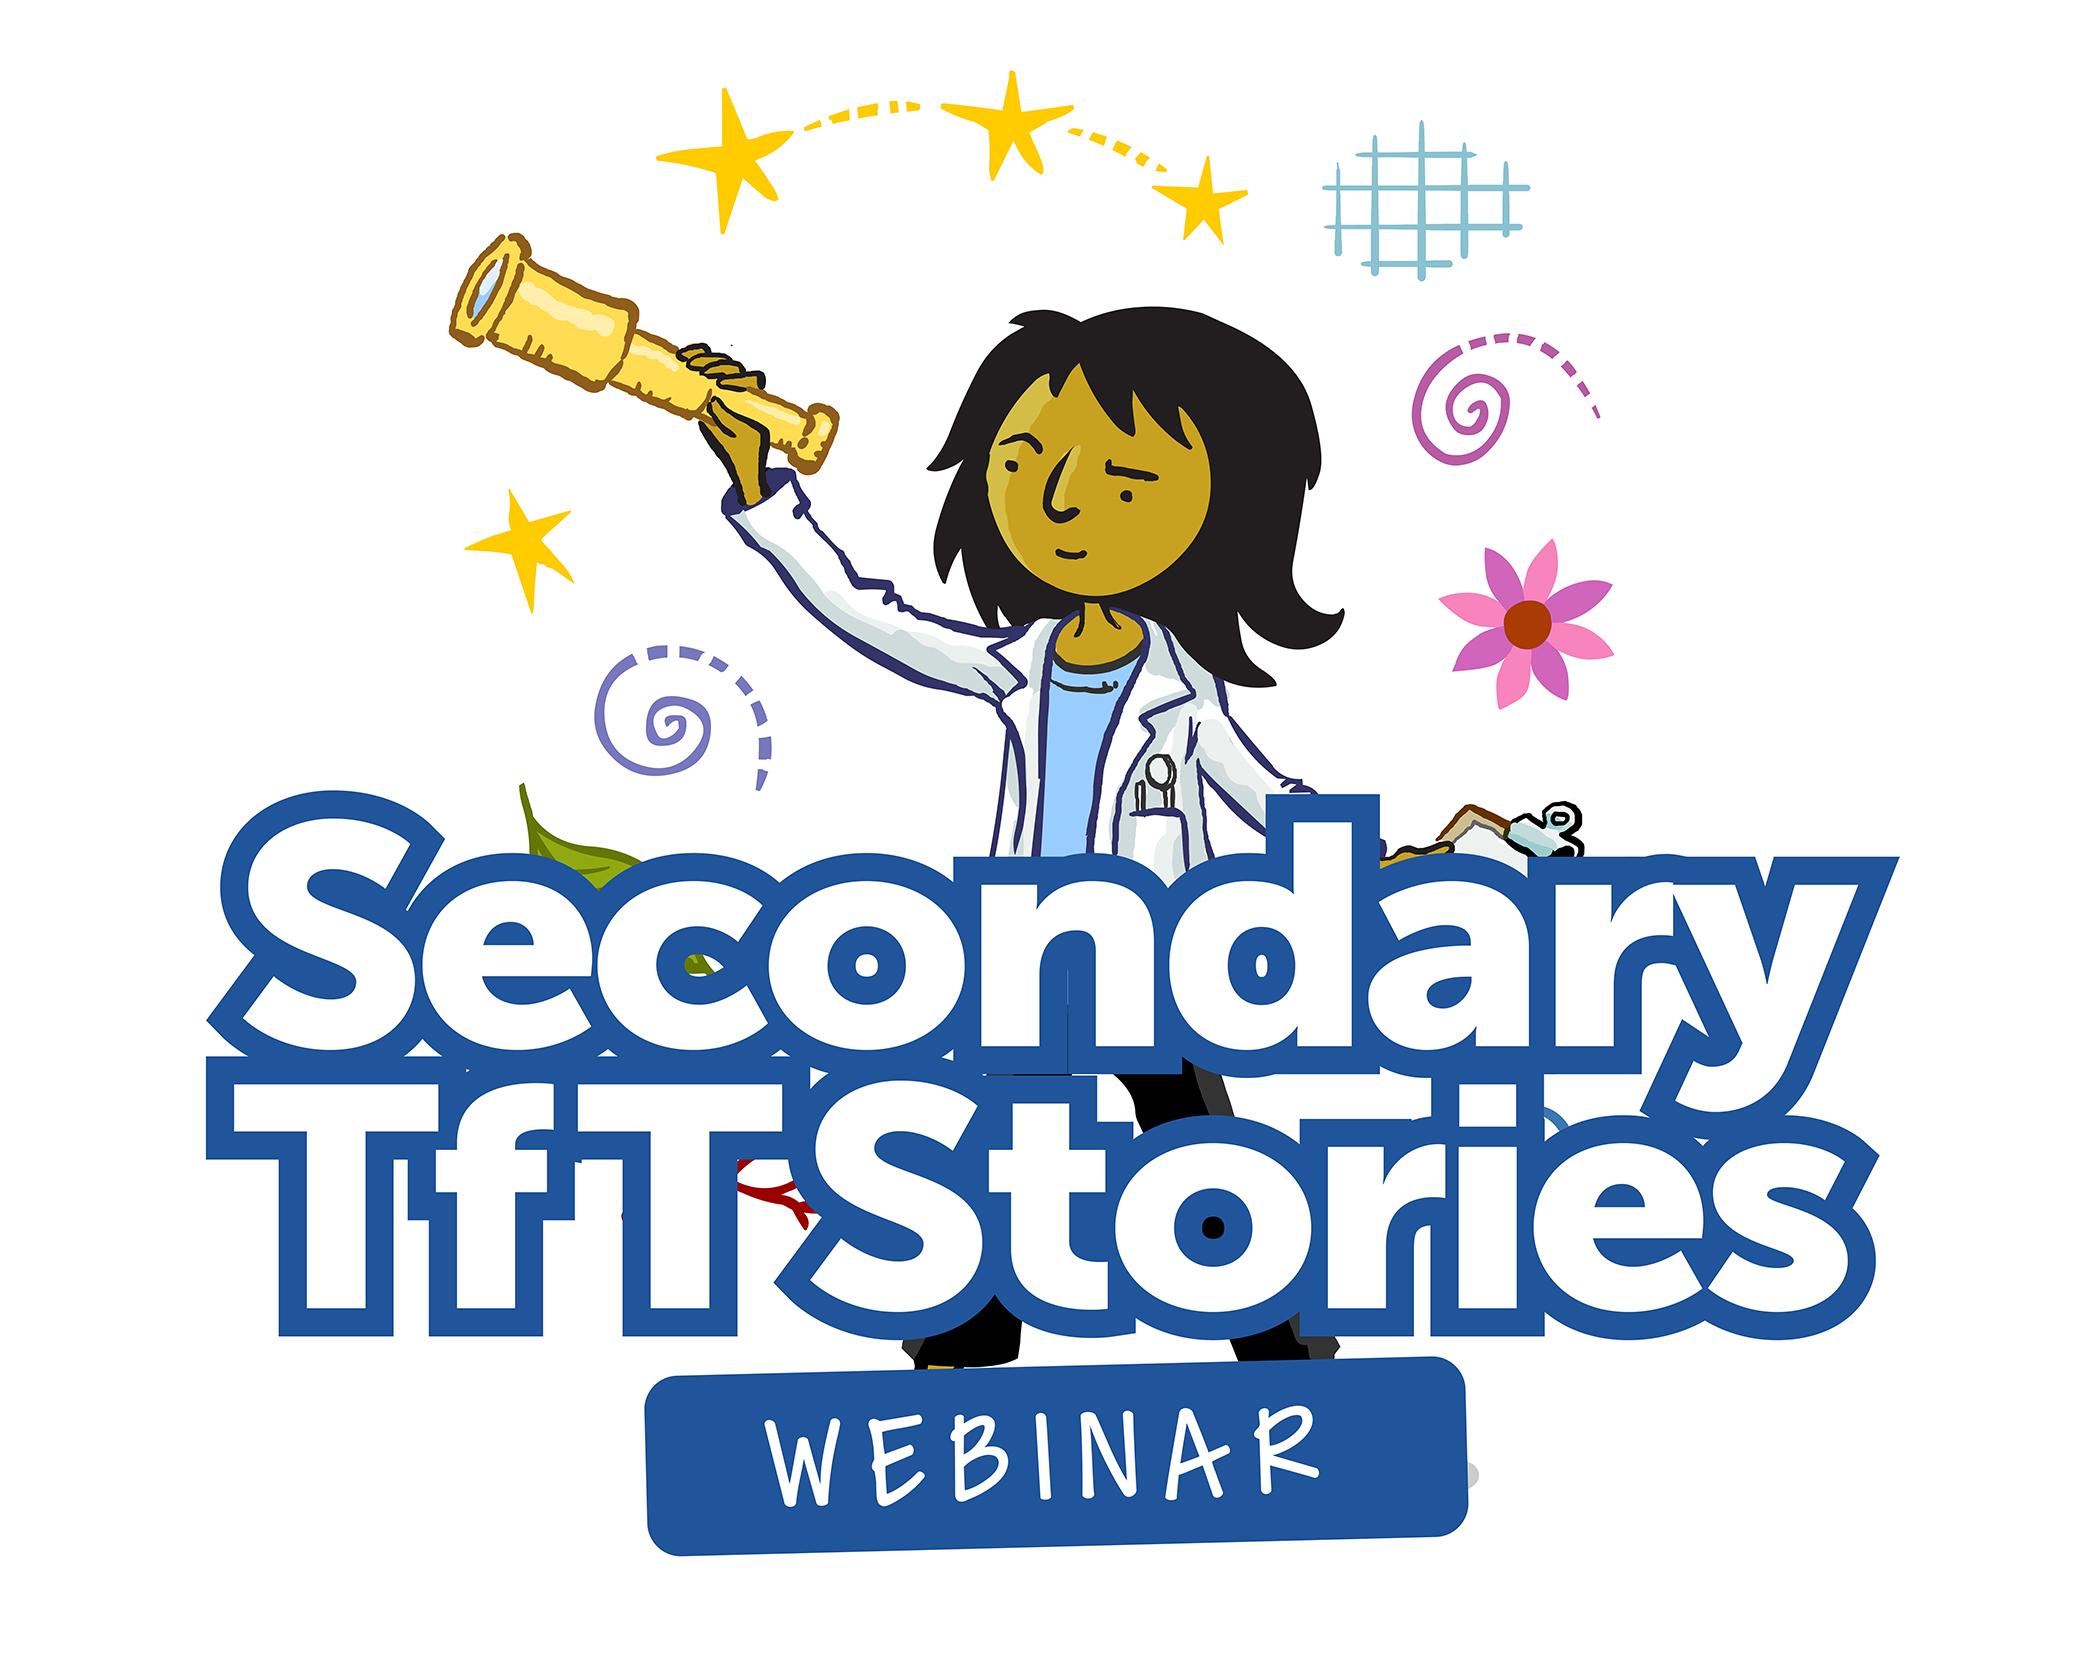 TfT Secondary Stories Webinar